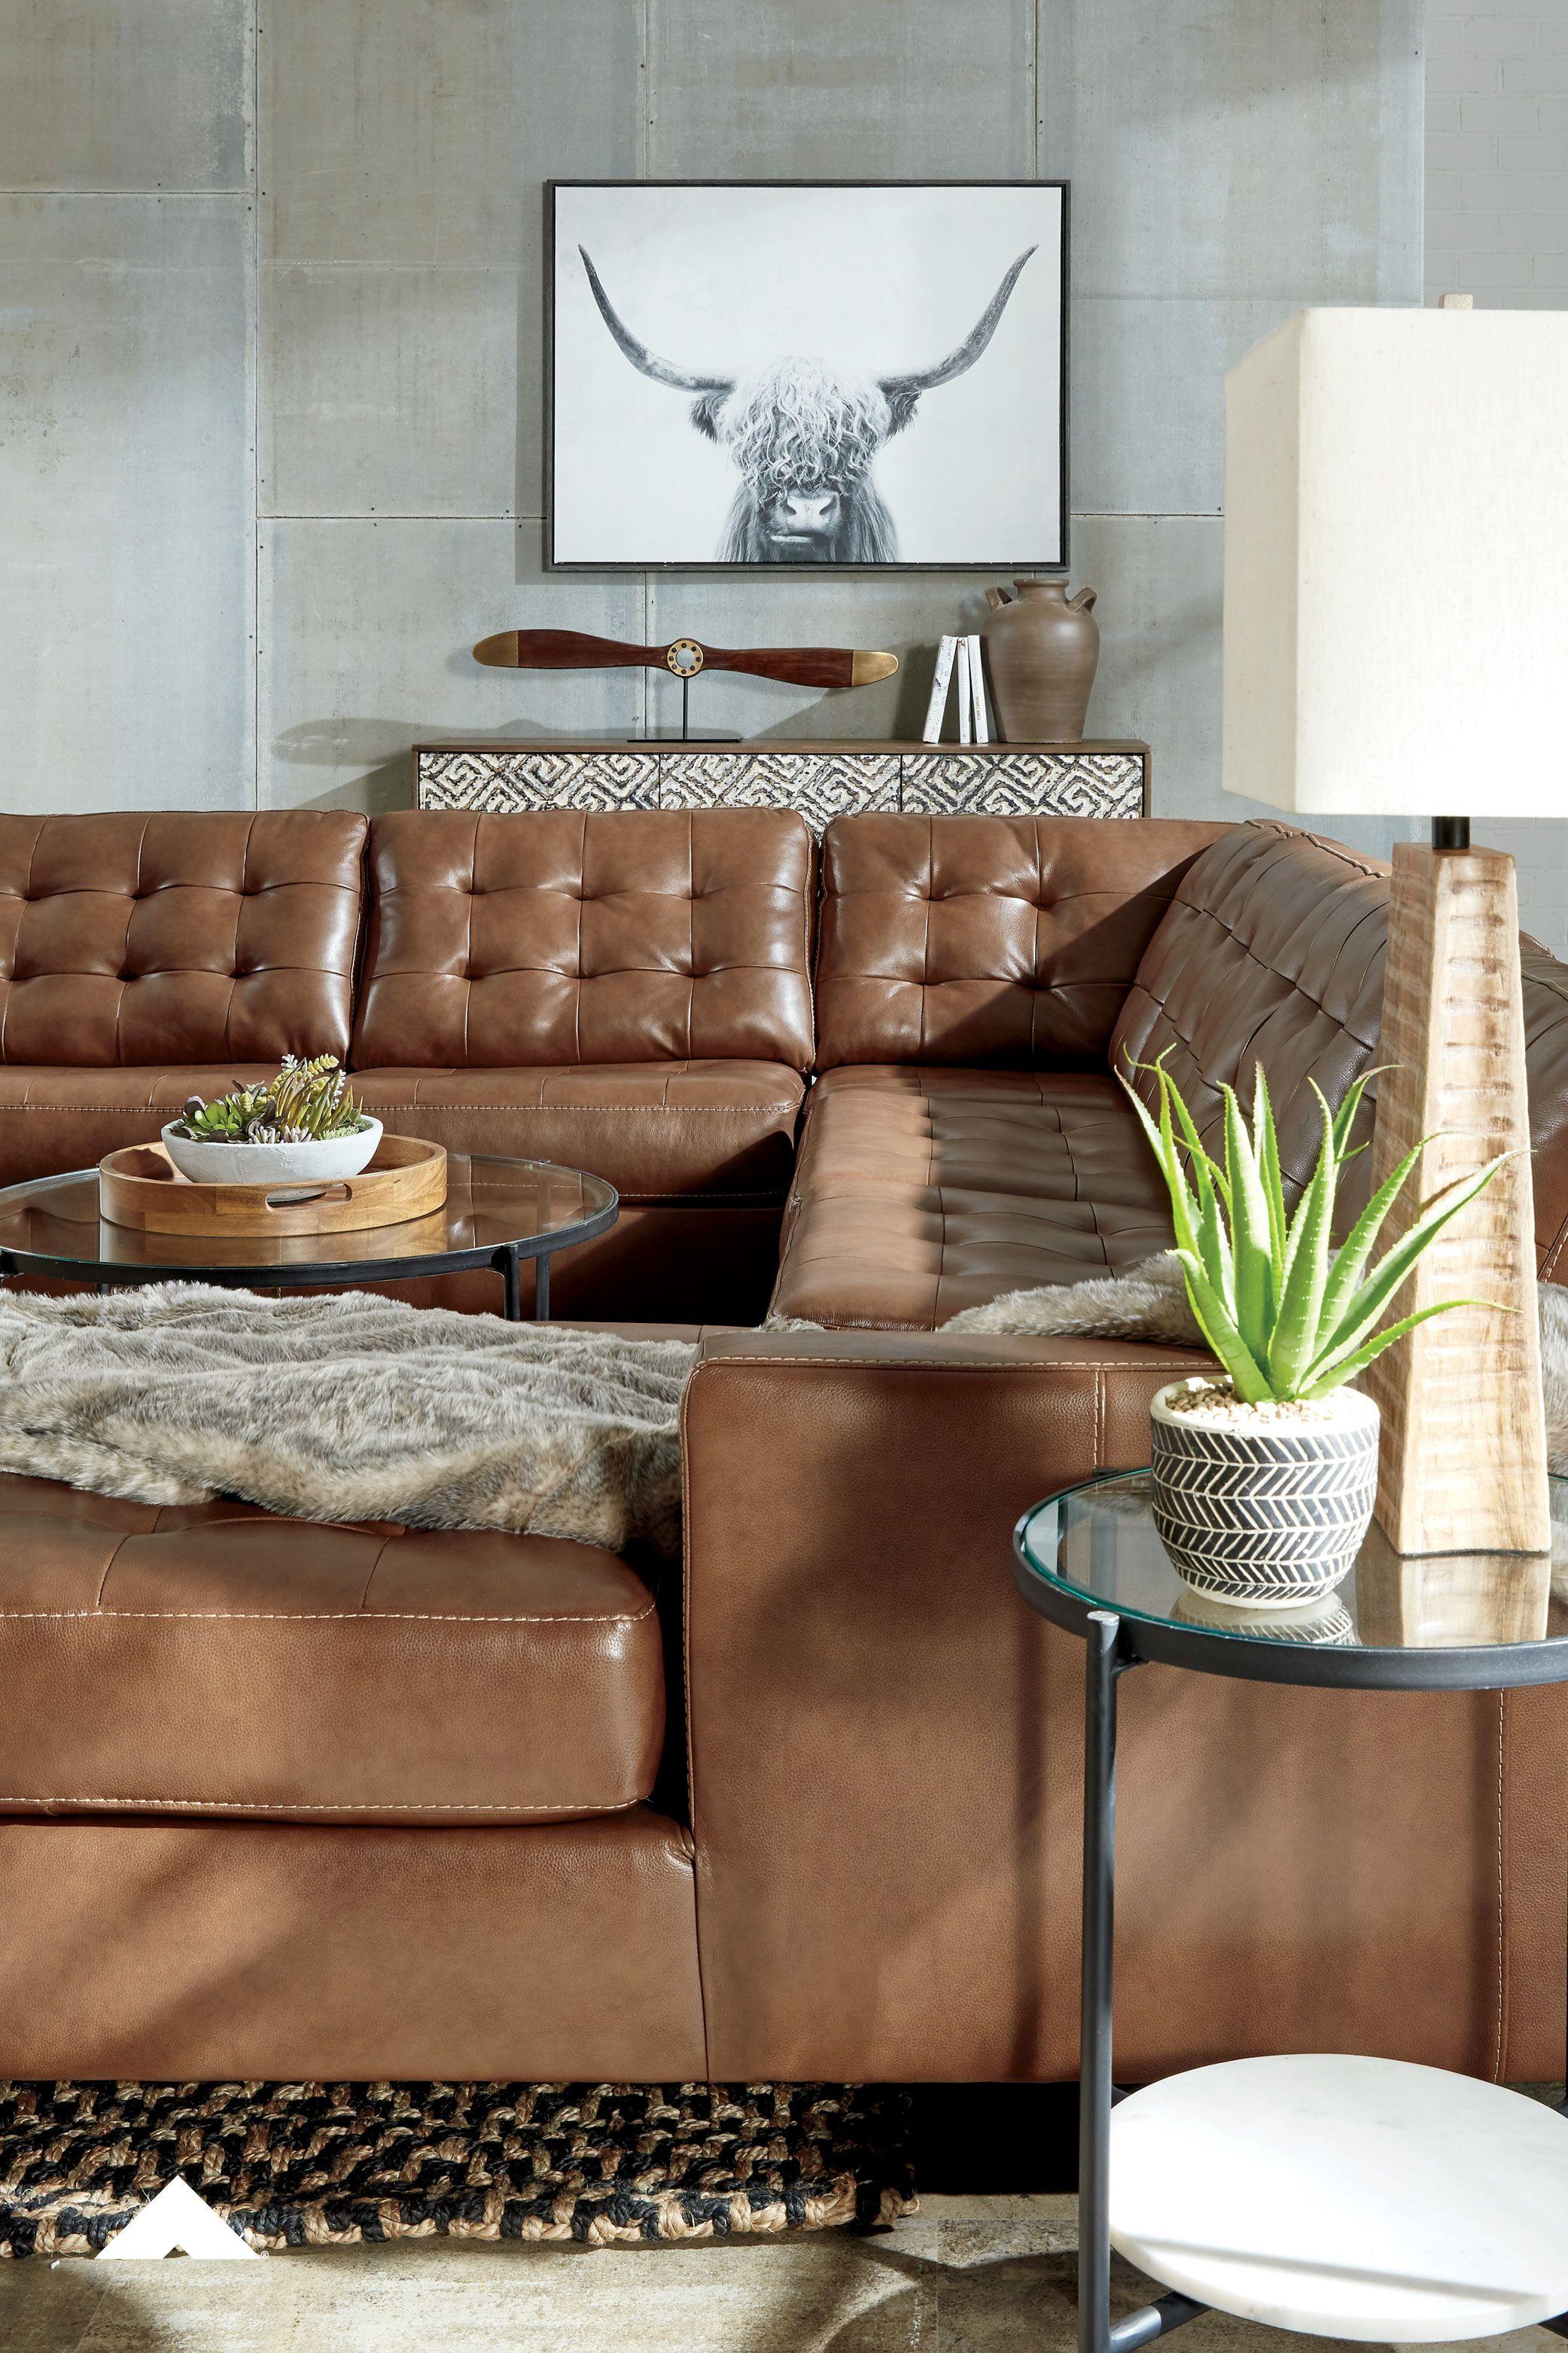 Baskove Auburn Sectional By Ashley Furniture Ashleyfurniture Leather Sectional Furniture Sectional